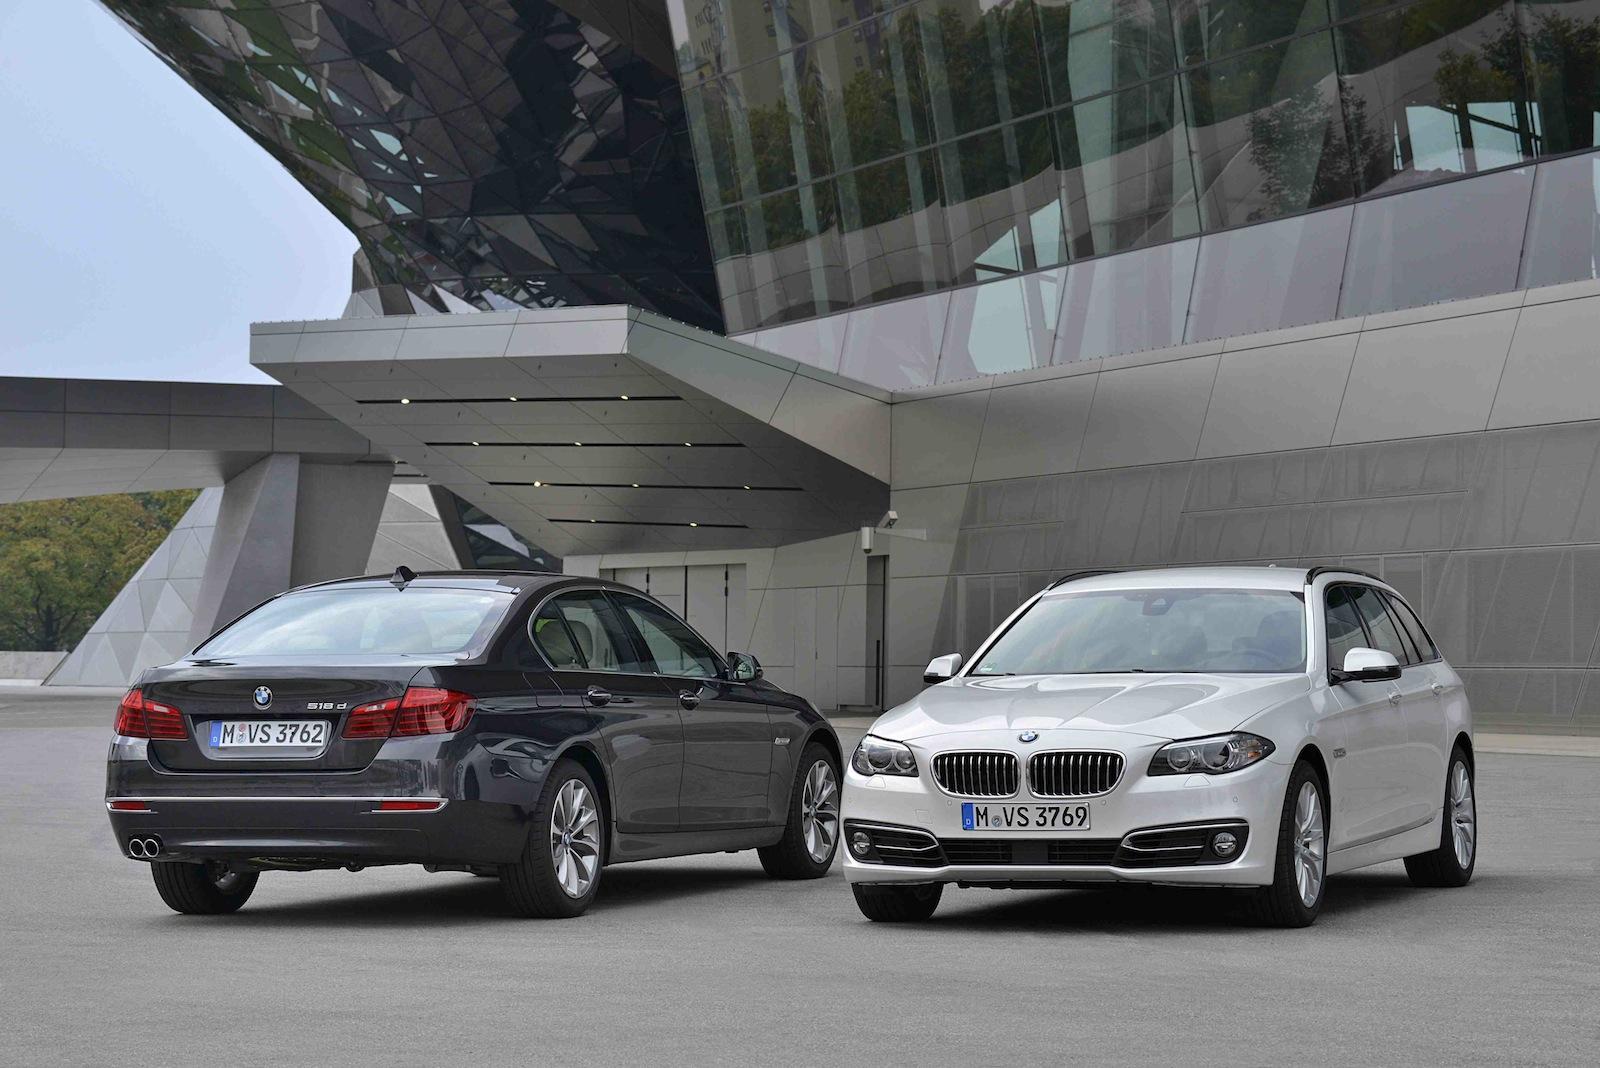 BMW 518D 520D 2014 03